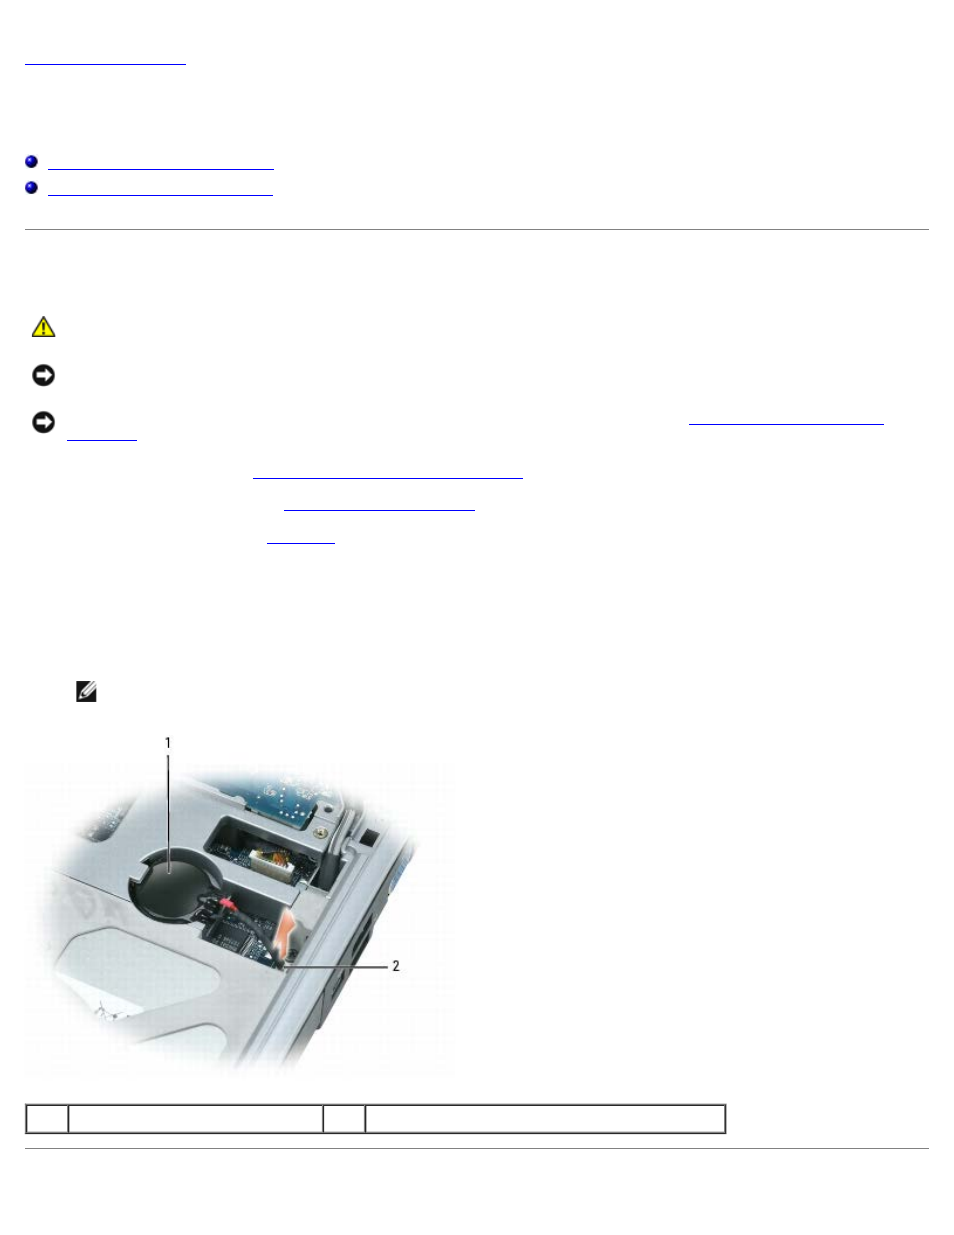 xps m1210 manual free owners manual u2022 rh wordworksbysea com Dell XPS M2010 Dell XPS M1730